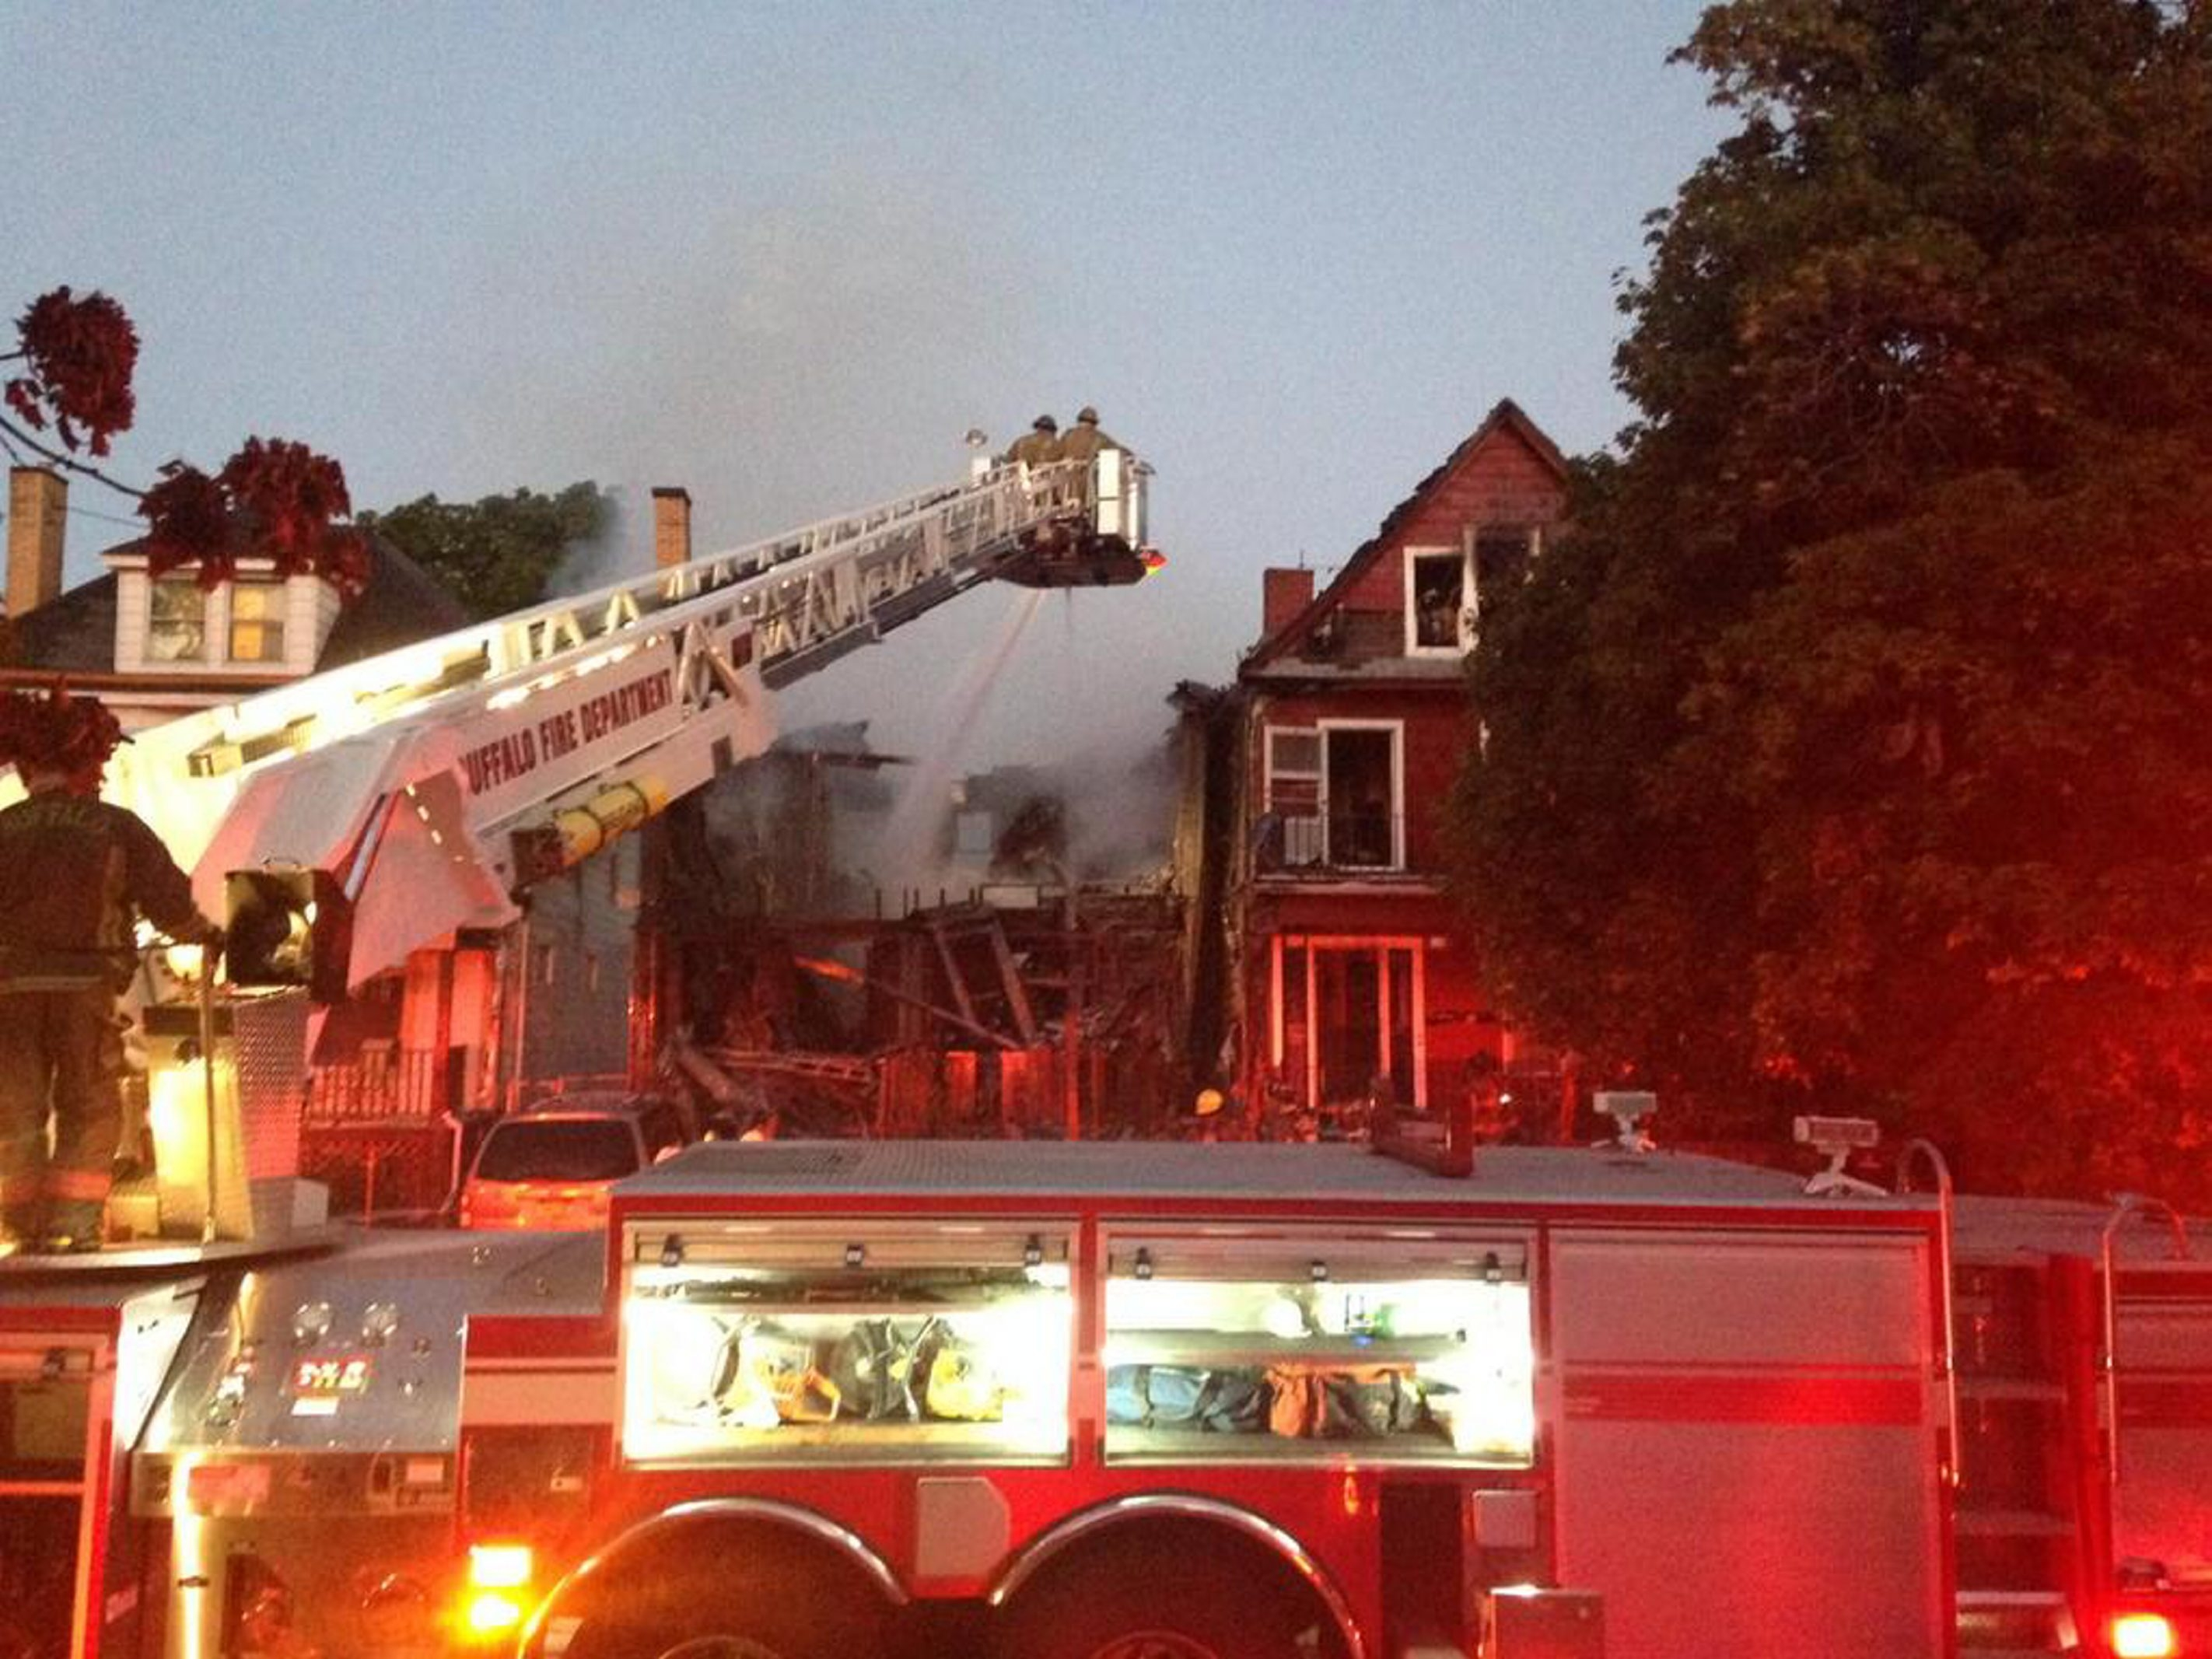 Firefighters on the scene of an early morning fire on Herkimer Street on Buffalo's West Side. (John Hickey/Buffalo News)